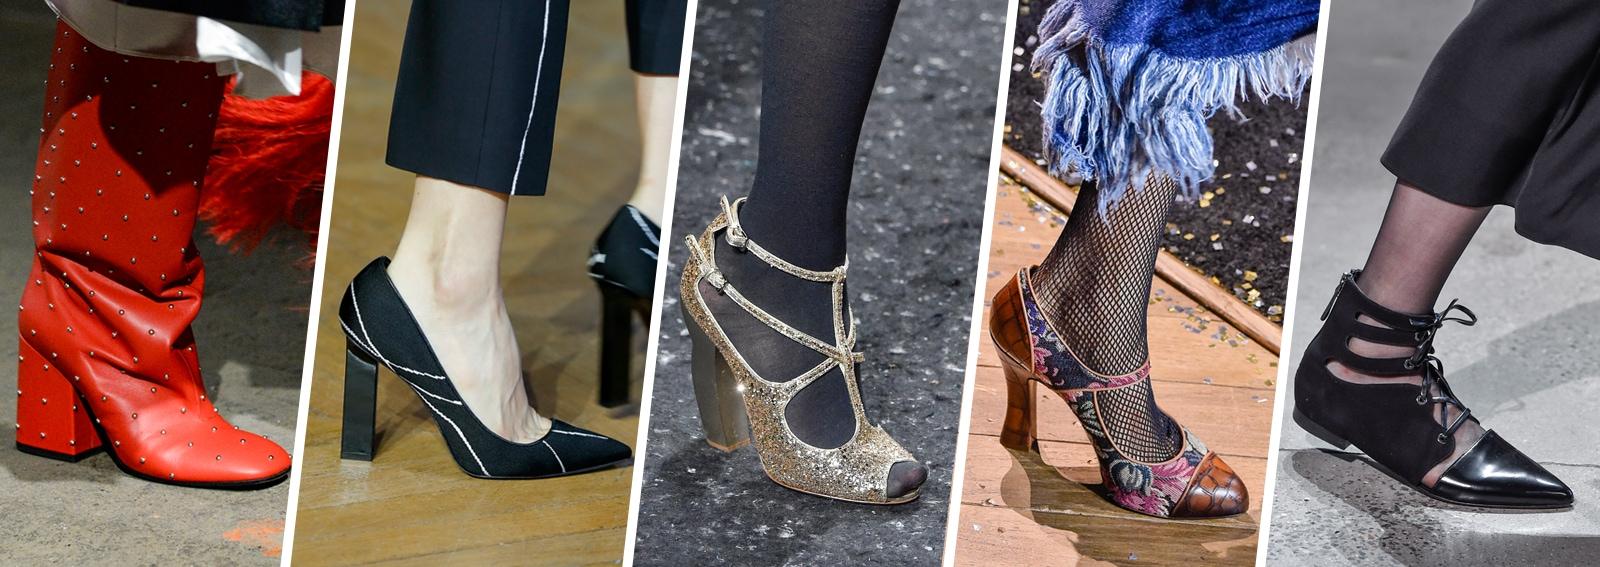 DESKTOP_Recap_scarpe moda AI 19-20